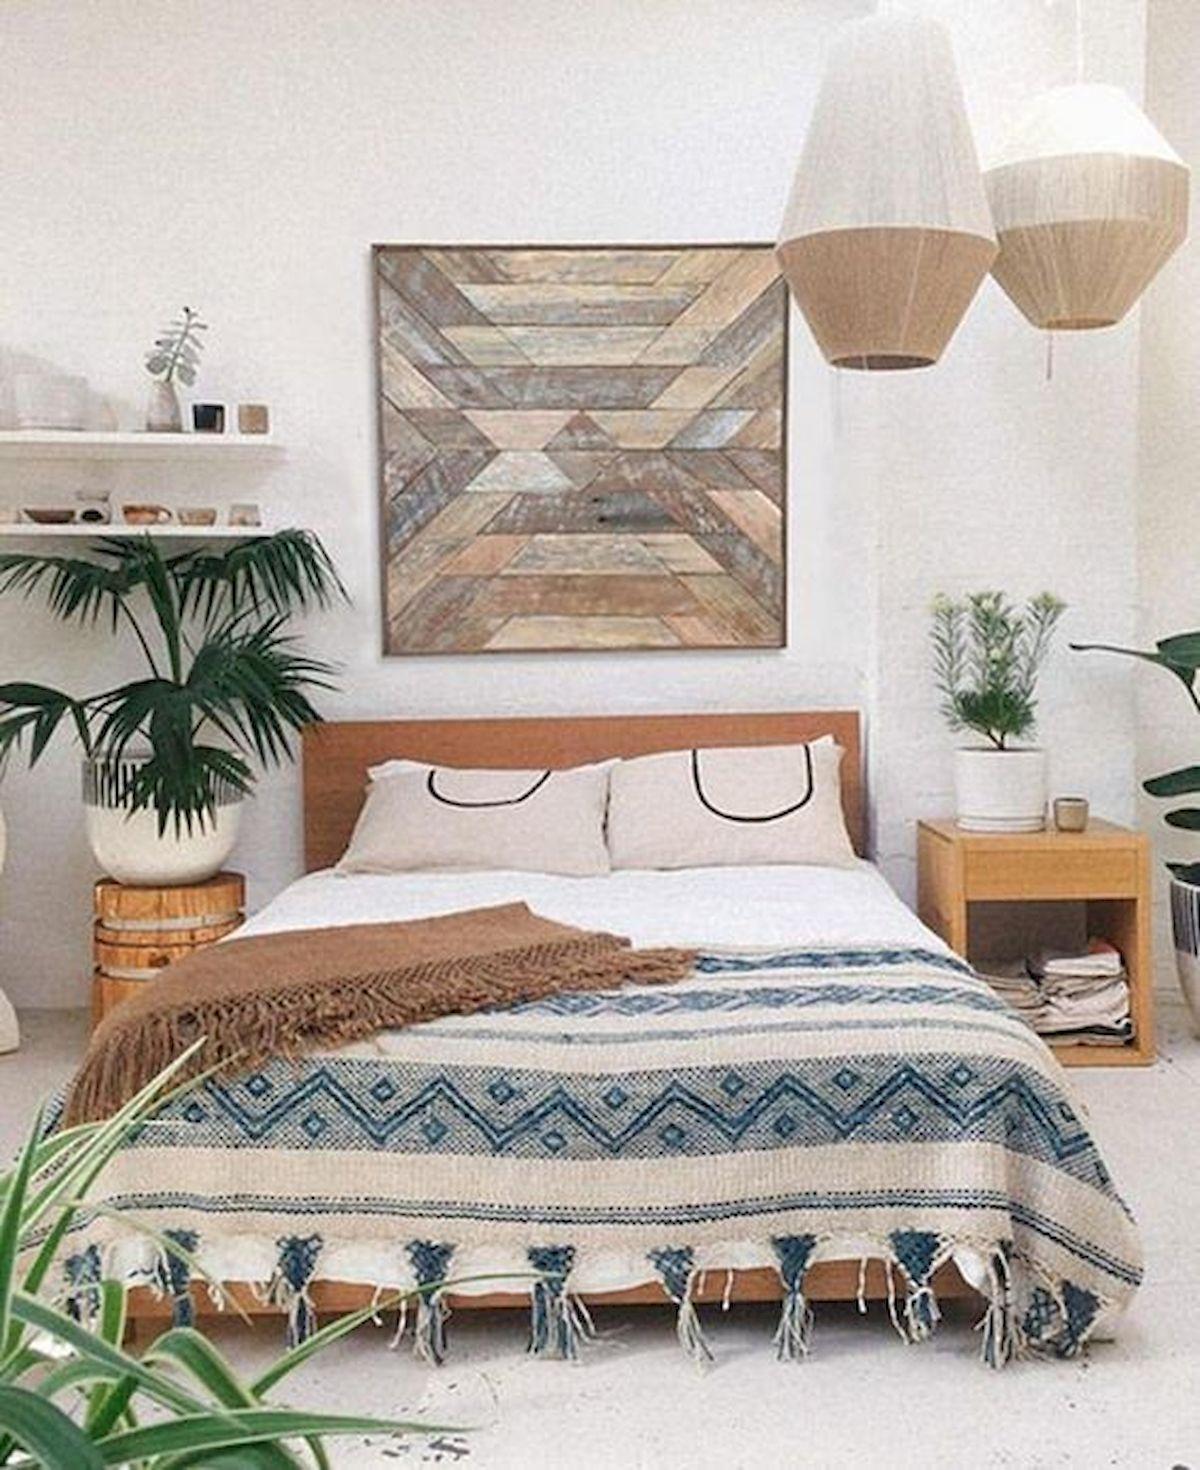 40 Amazing Farmhouse Boho Bedroom Design And Decor Ideas (14)